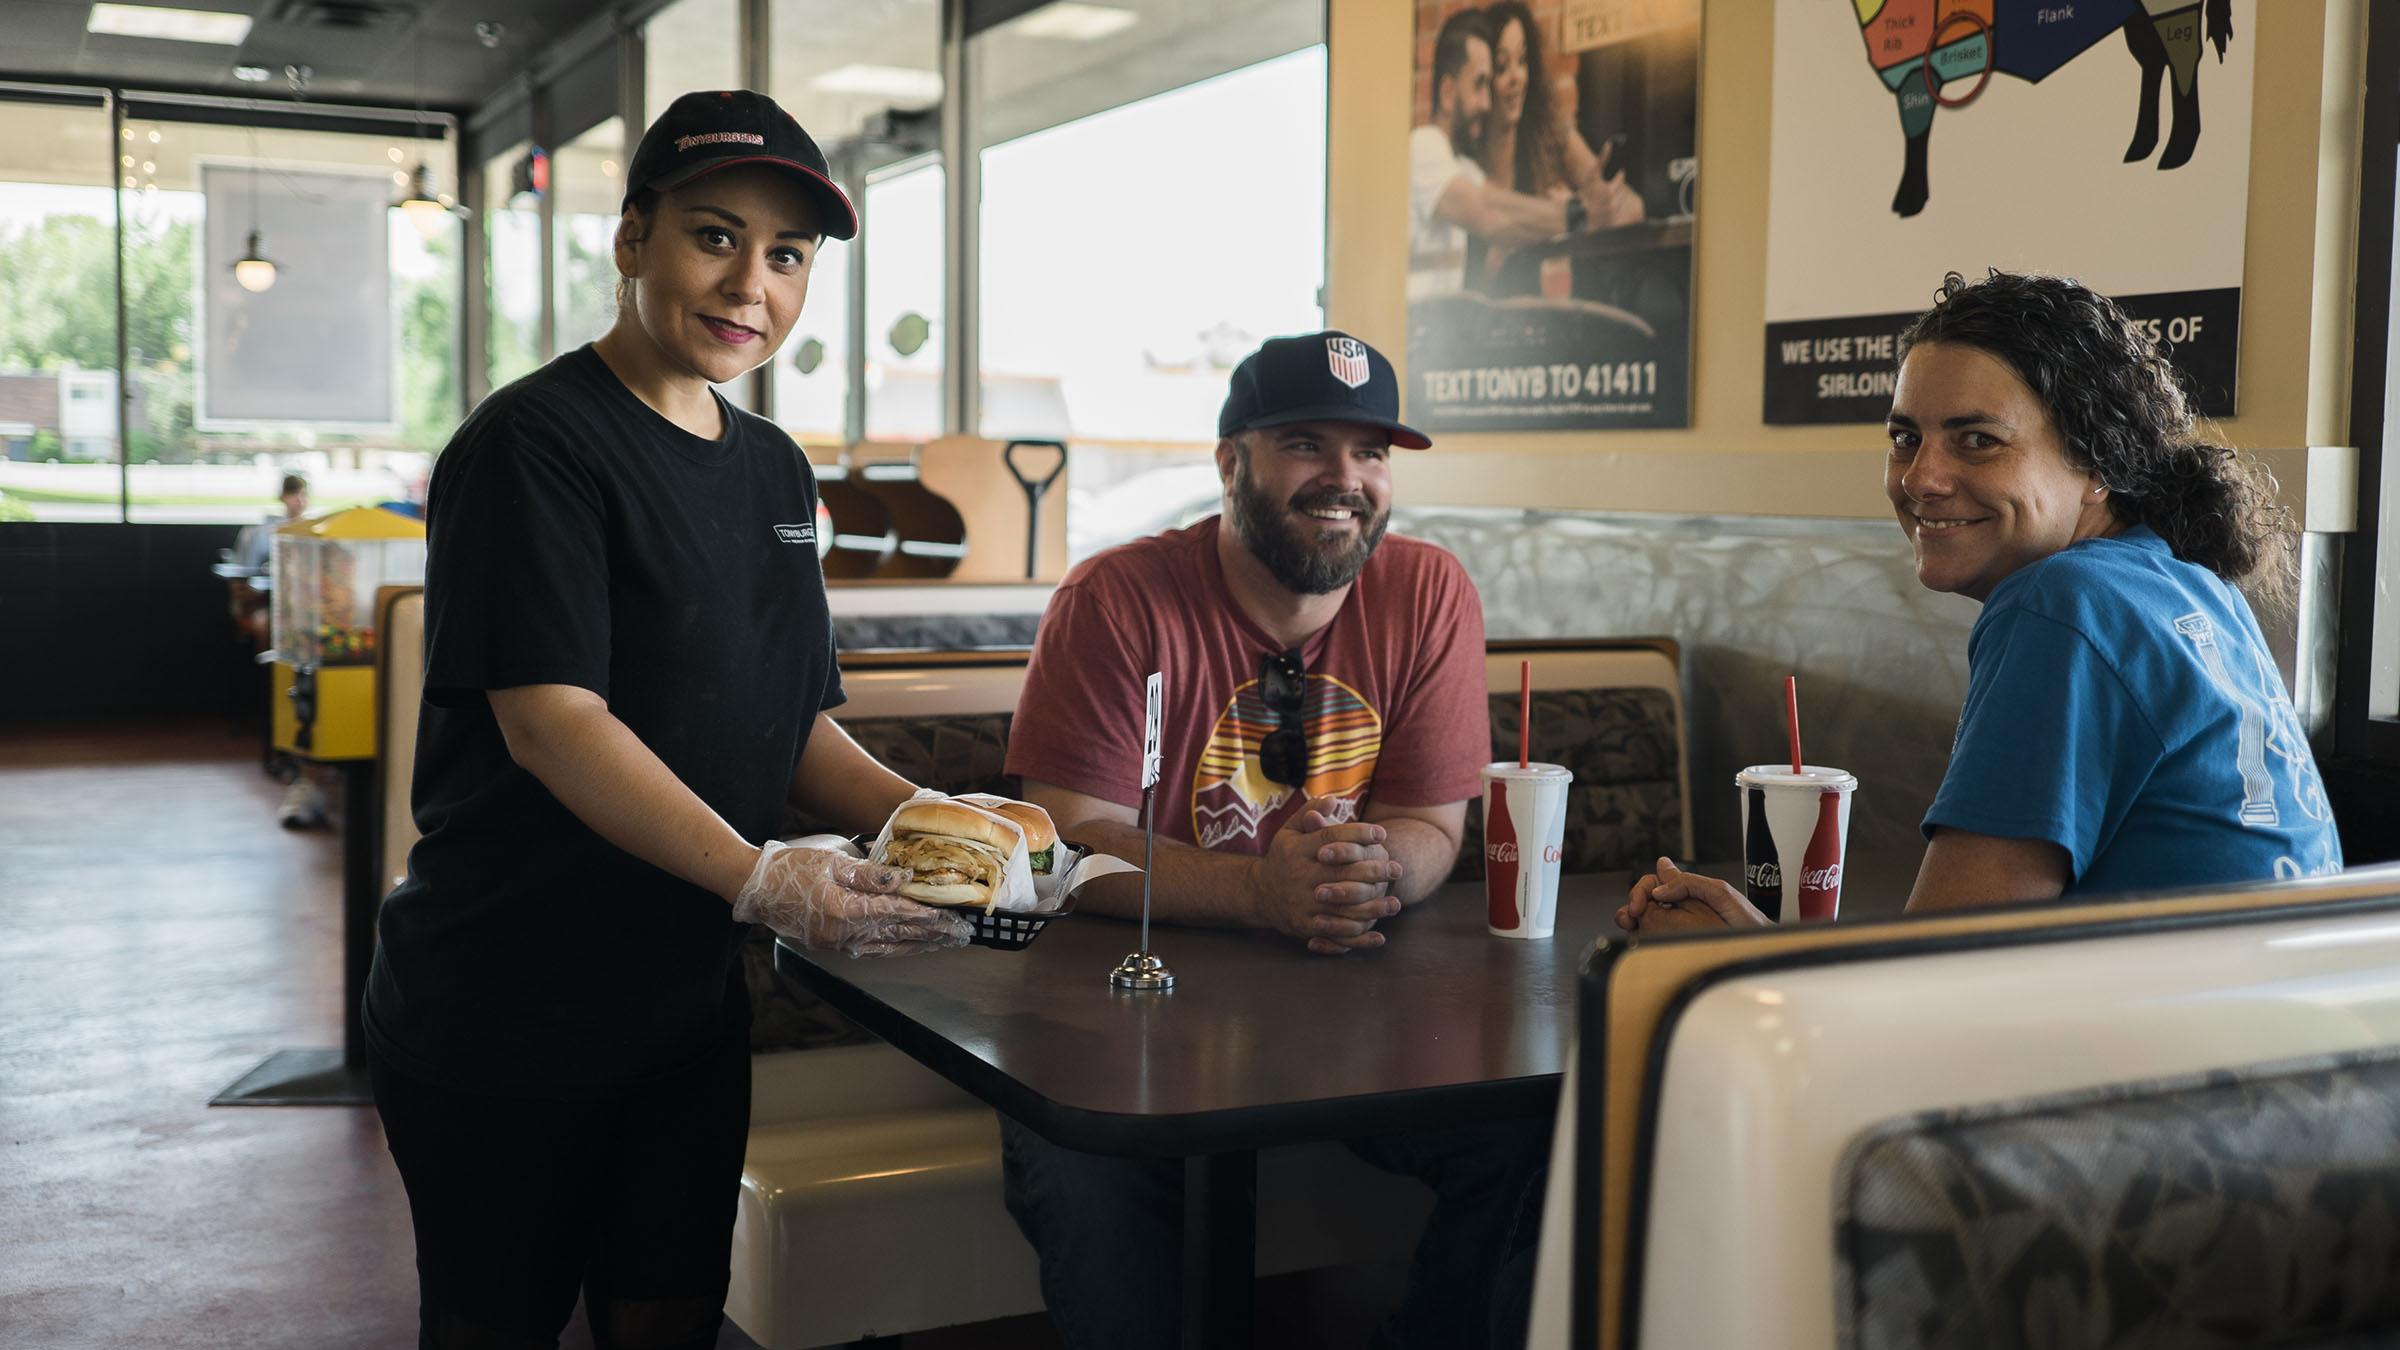 tonyburgers-big-american-story-01387.jpg